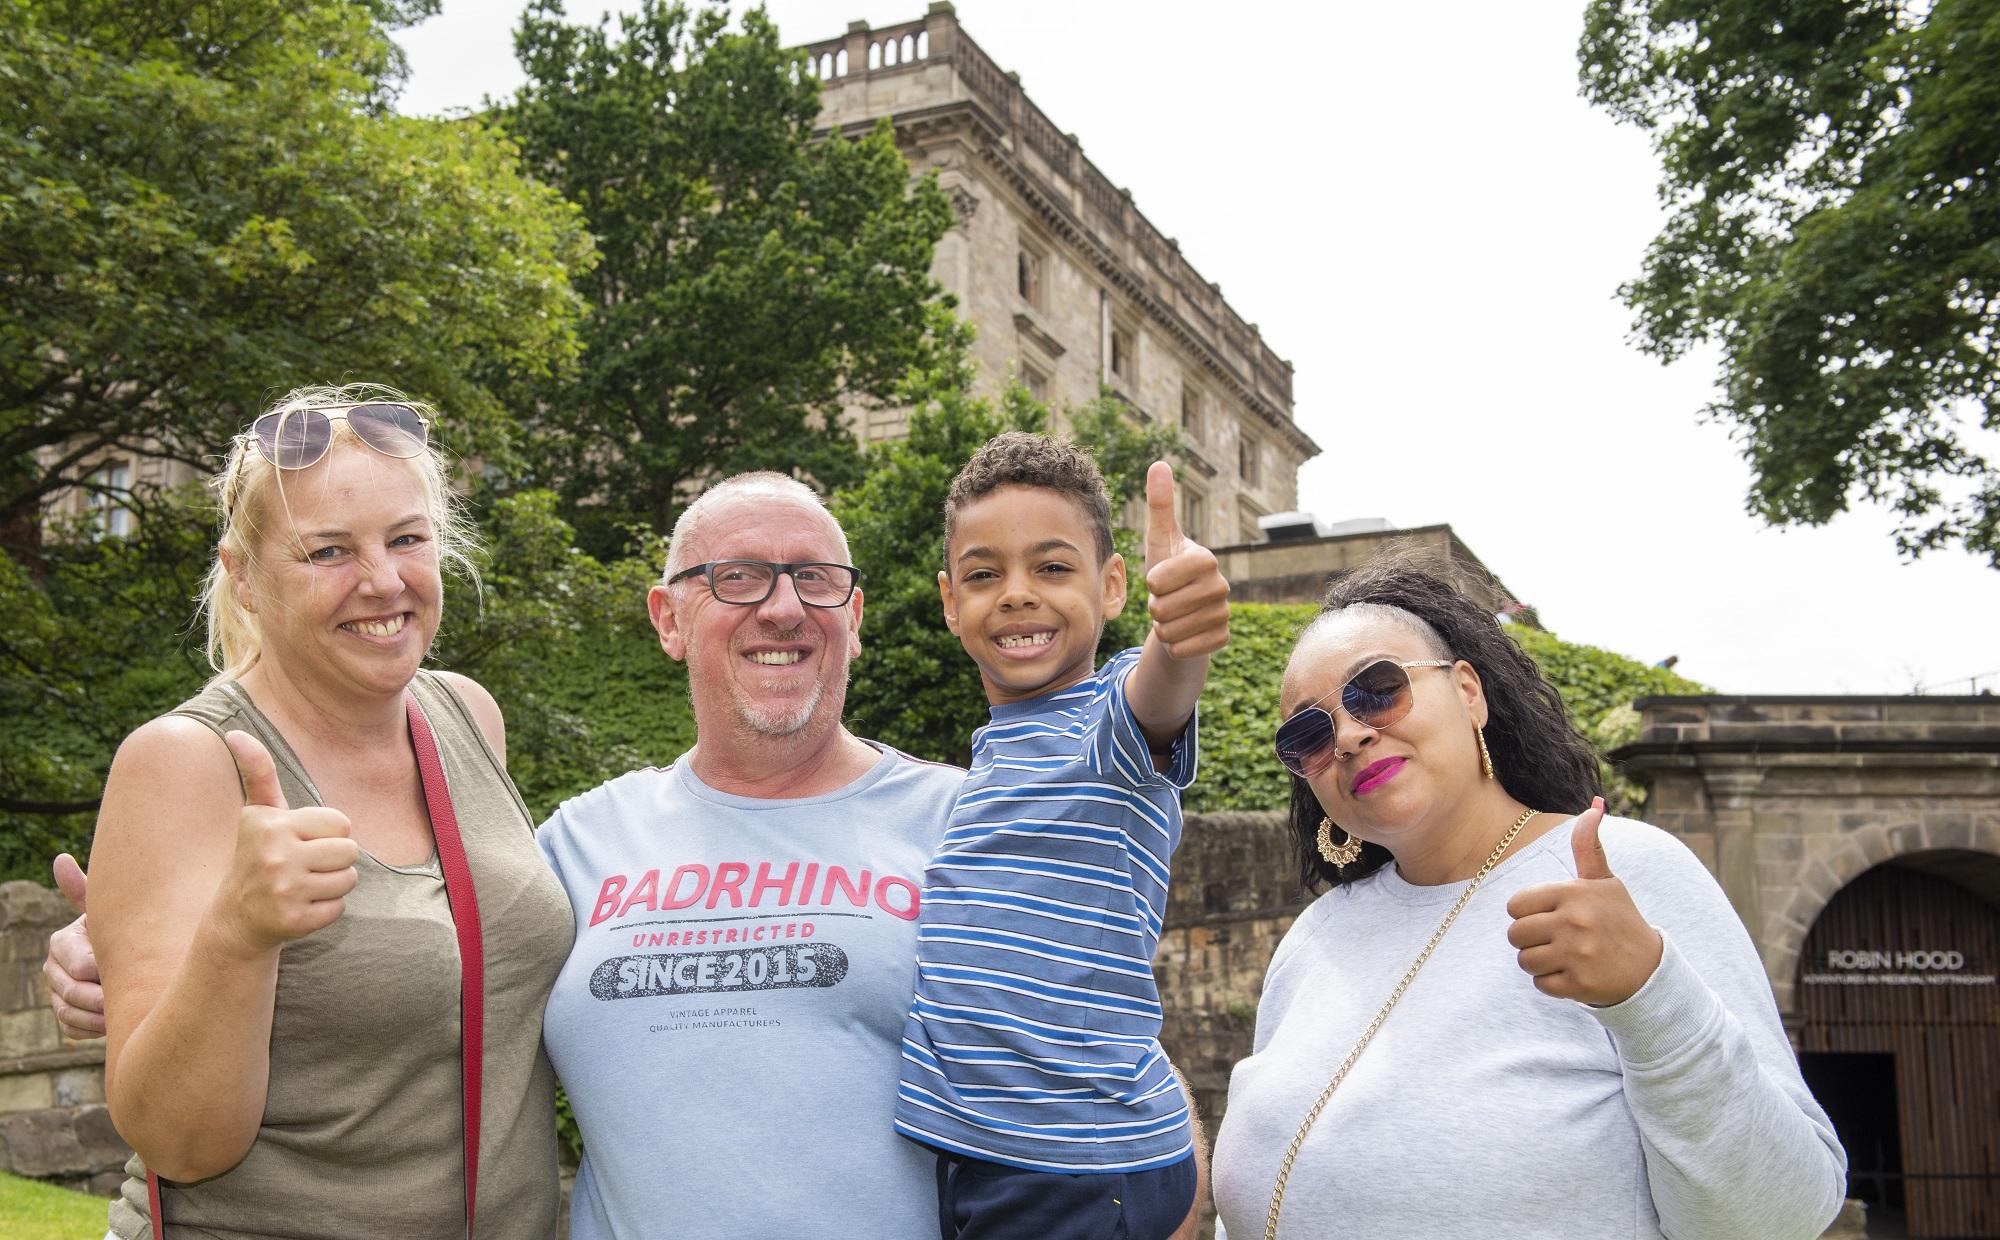 Nottingham boy enjoys his first-ever museum visit thanks to Nottingham Castle